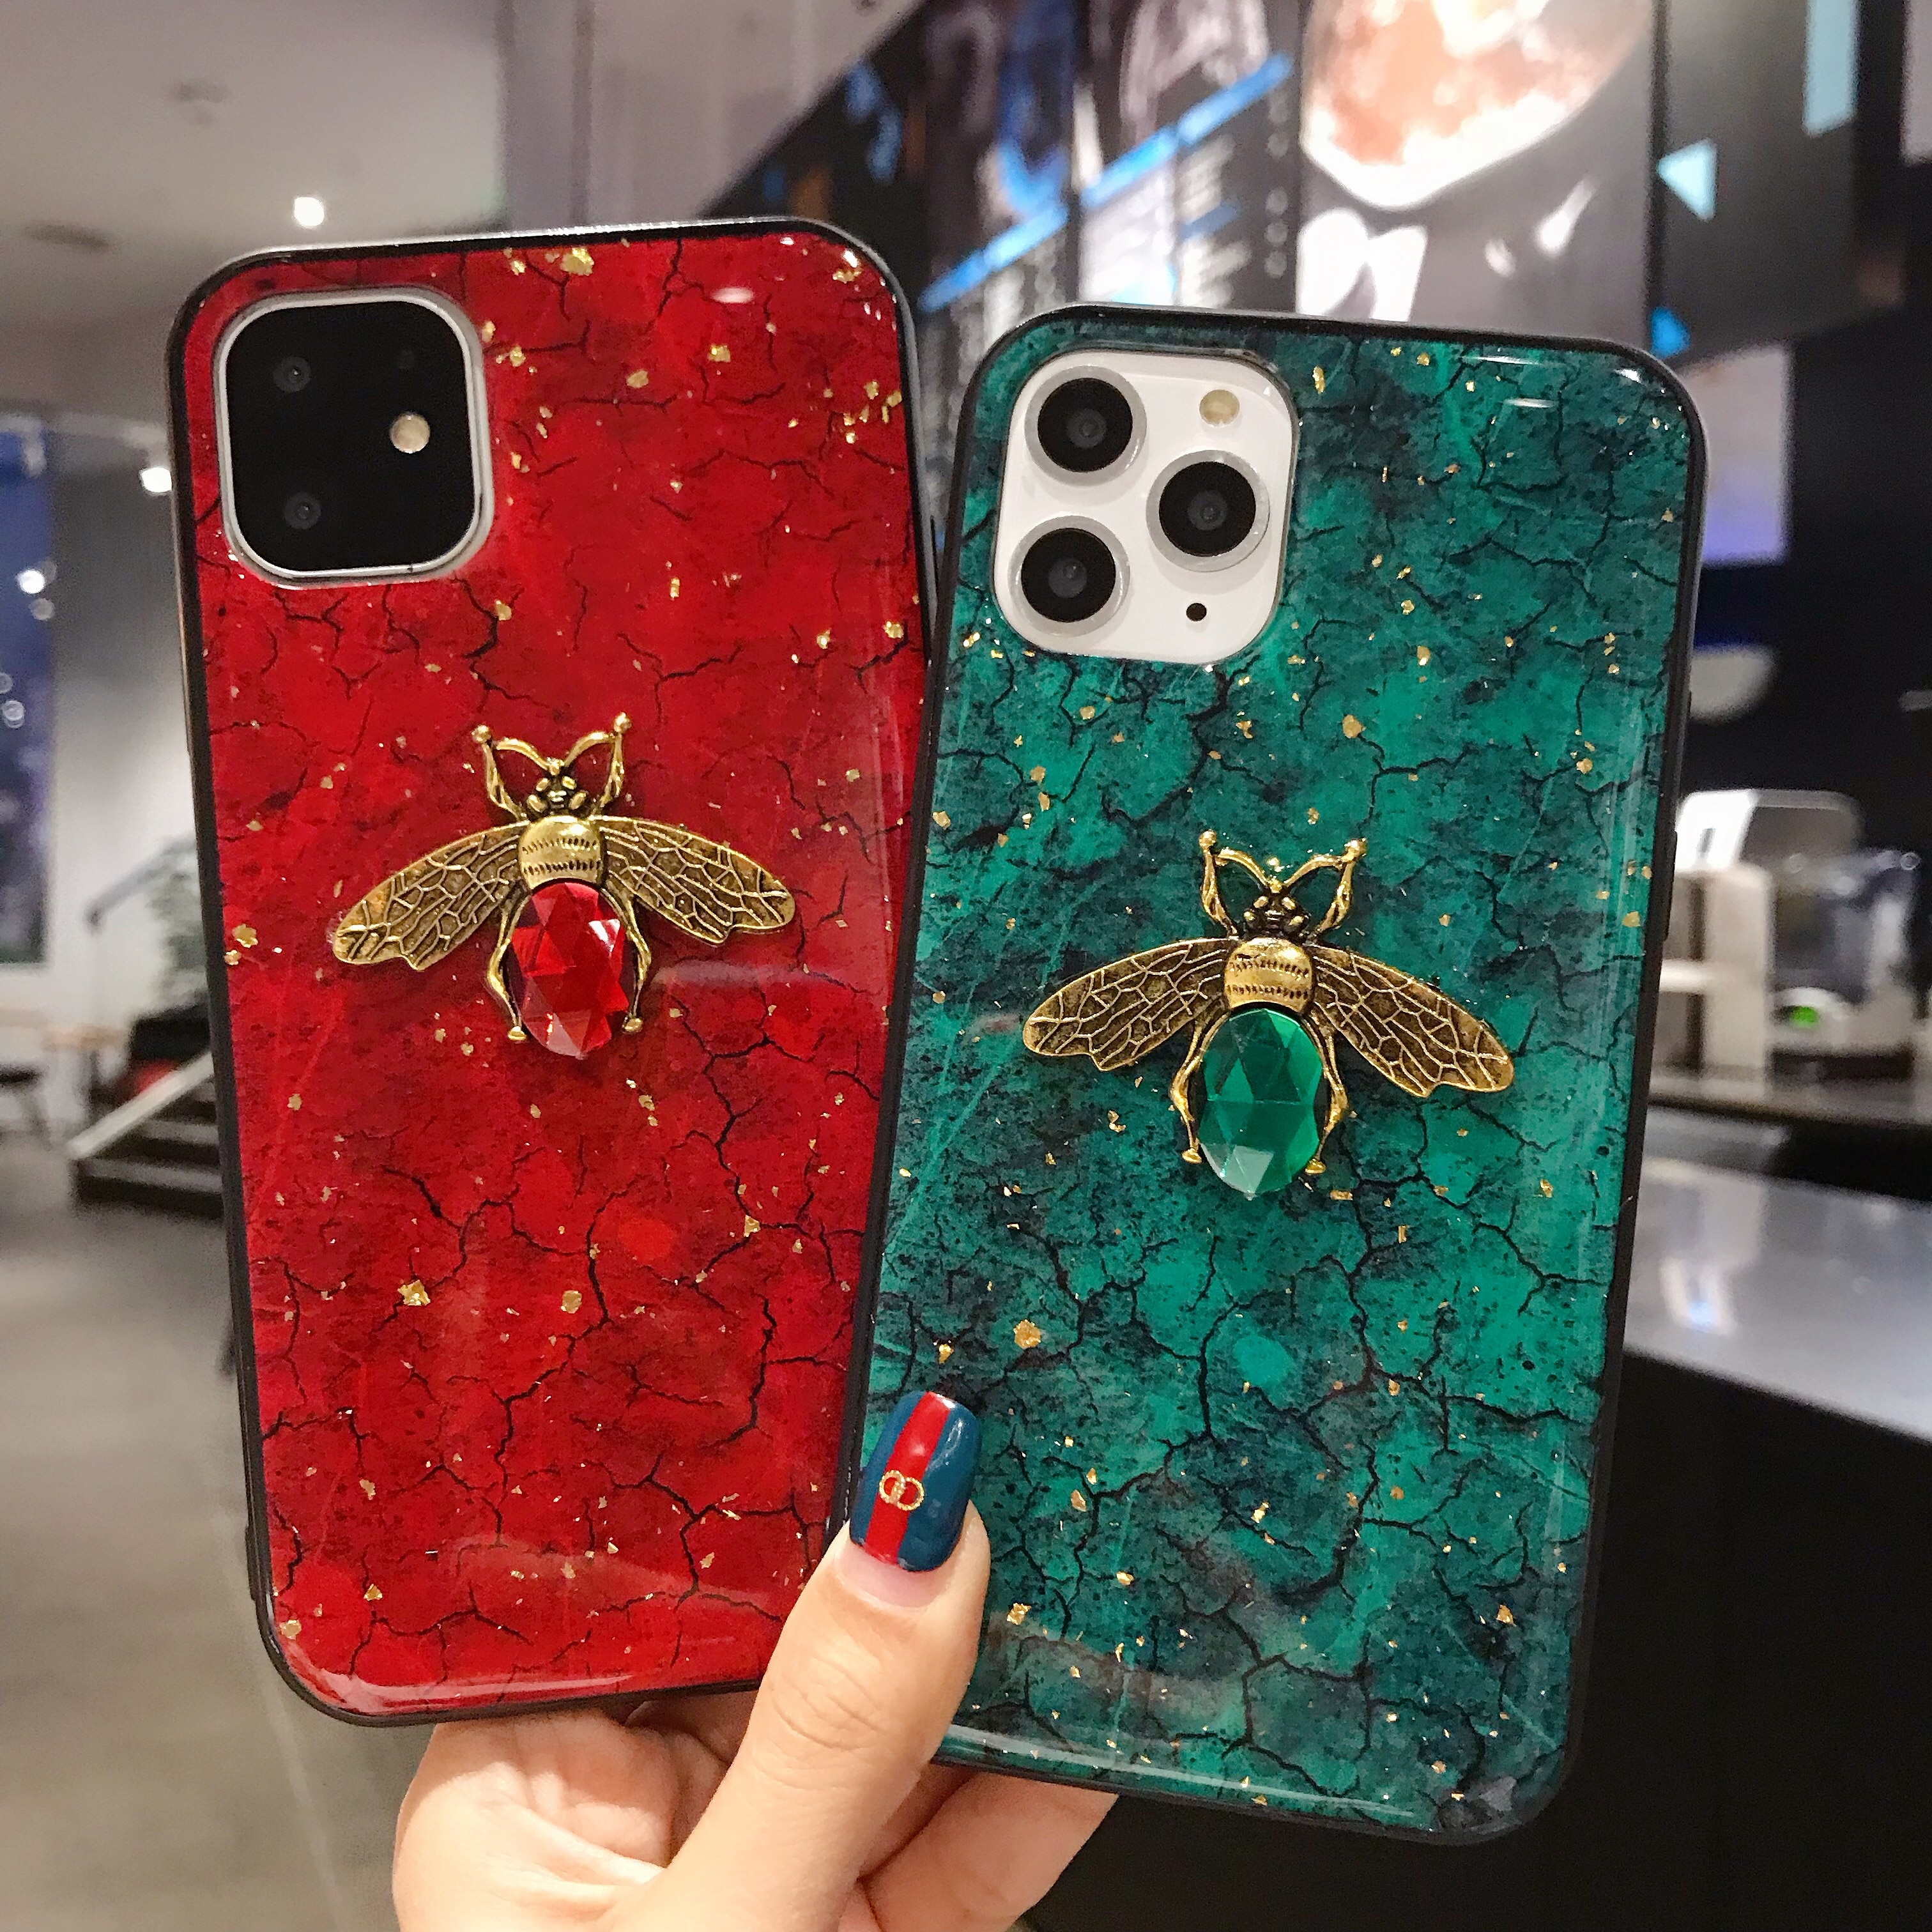 3D чехол для телефона с драгоценными камнями и пчелами для iPhone11, чехол для iPhone 11 Pro Max XR XS Max 7 8 6 6s Plus, чехол с мраморными блестками, задняя крышка...